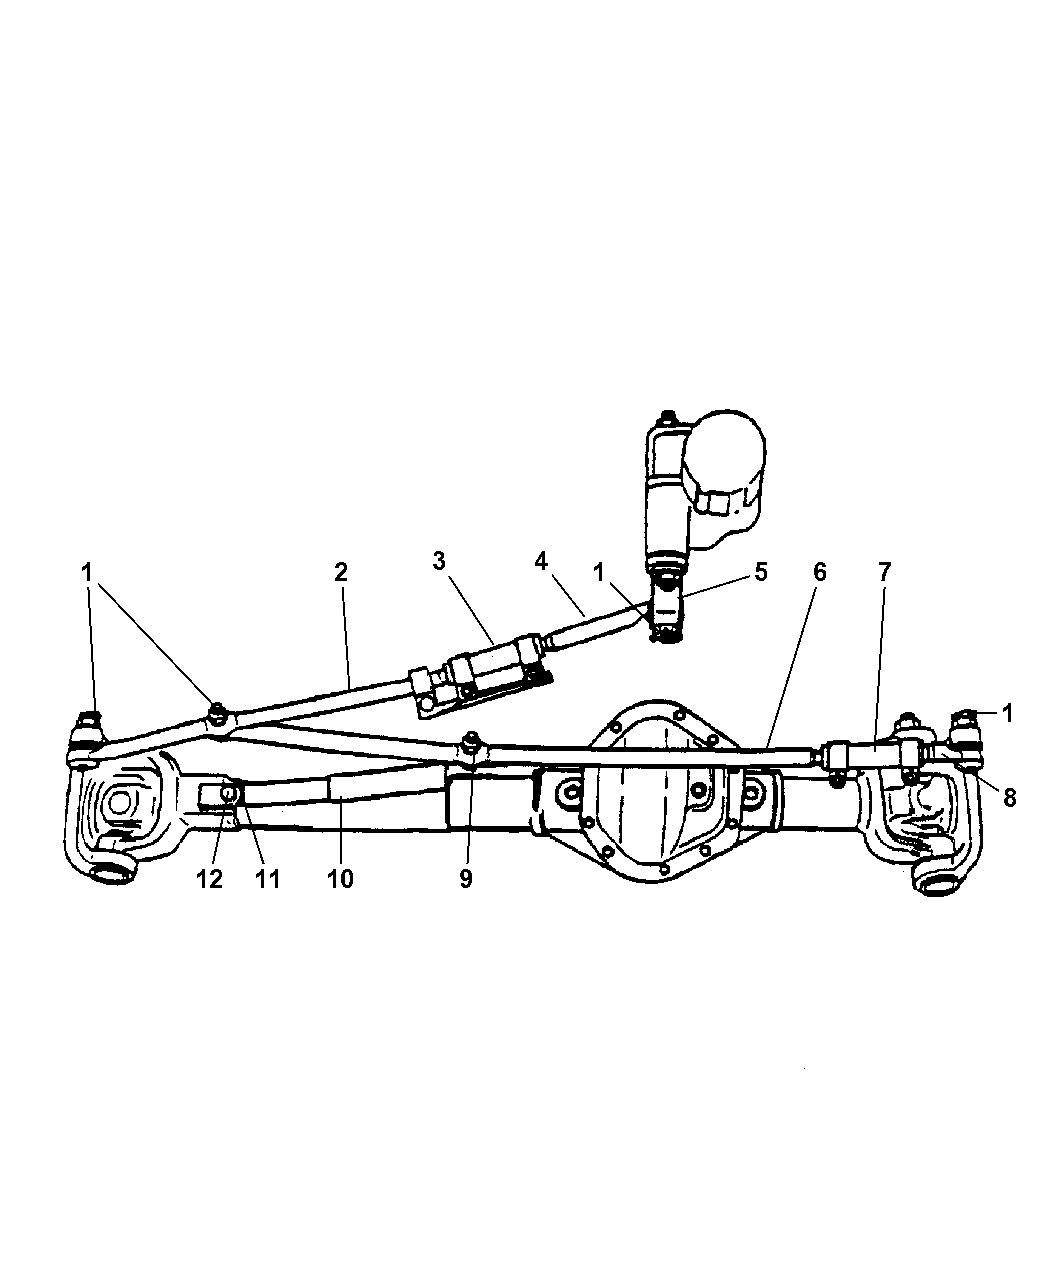 2004 Dodge Ram 2500 Steering Parts Diagram   Reviewmotors.co